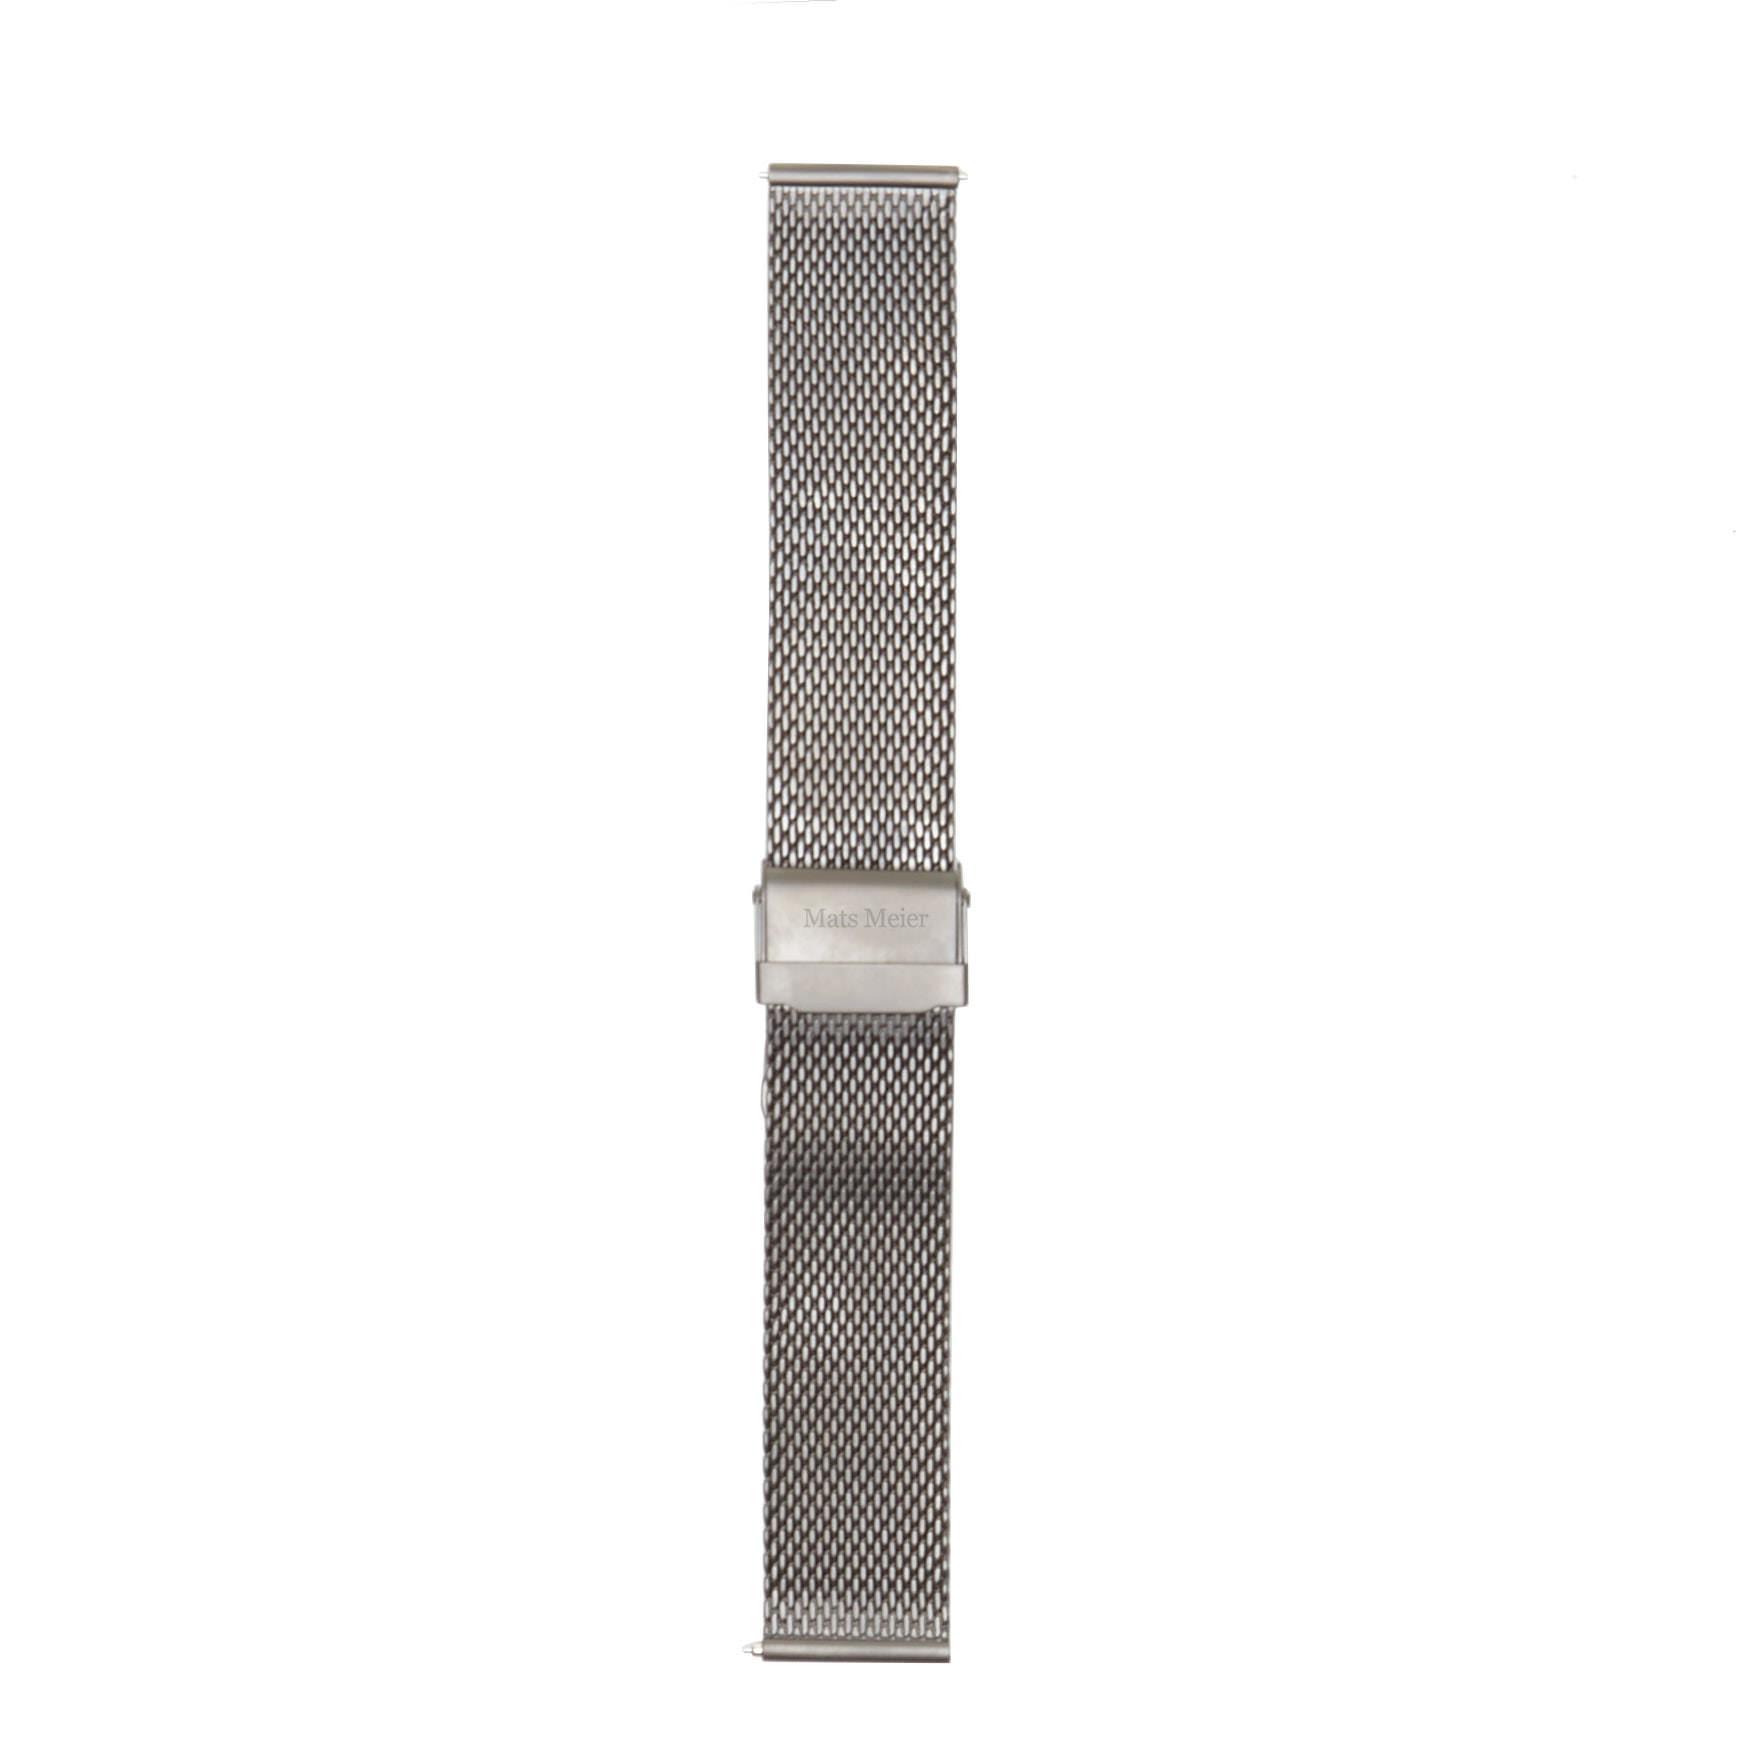 Mats Meier Mont Vélan klockarmband i stålnät 22 mm silverfärgad